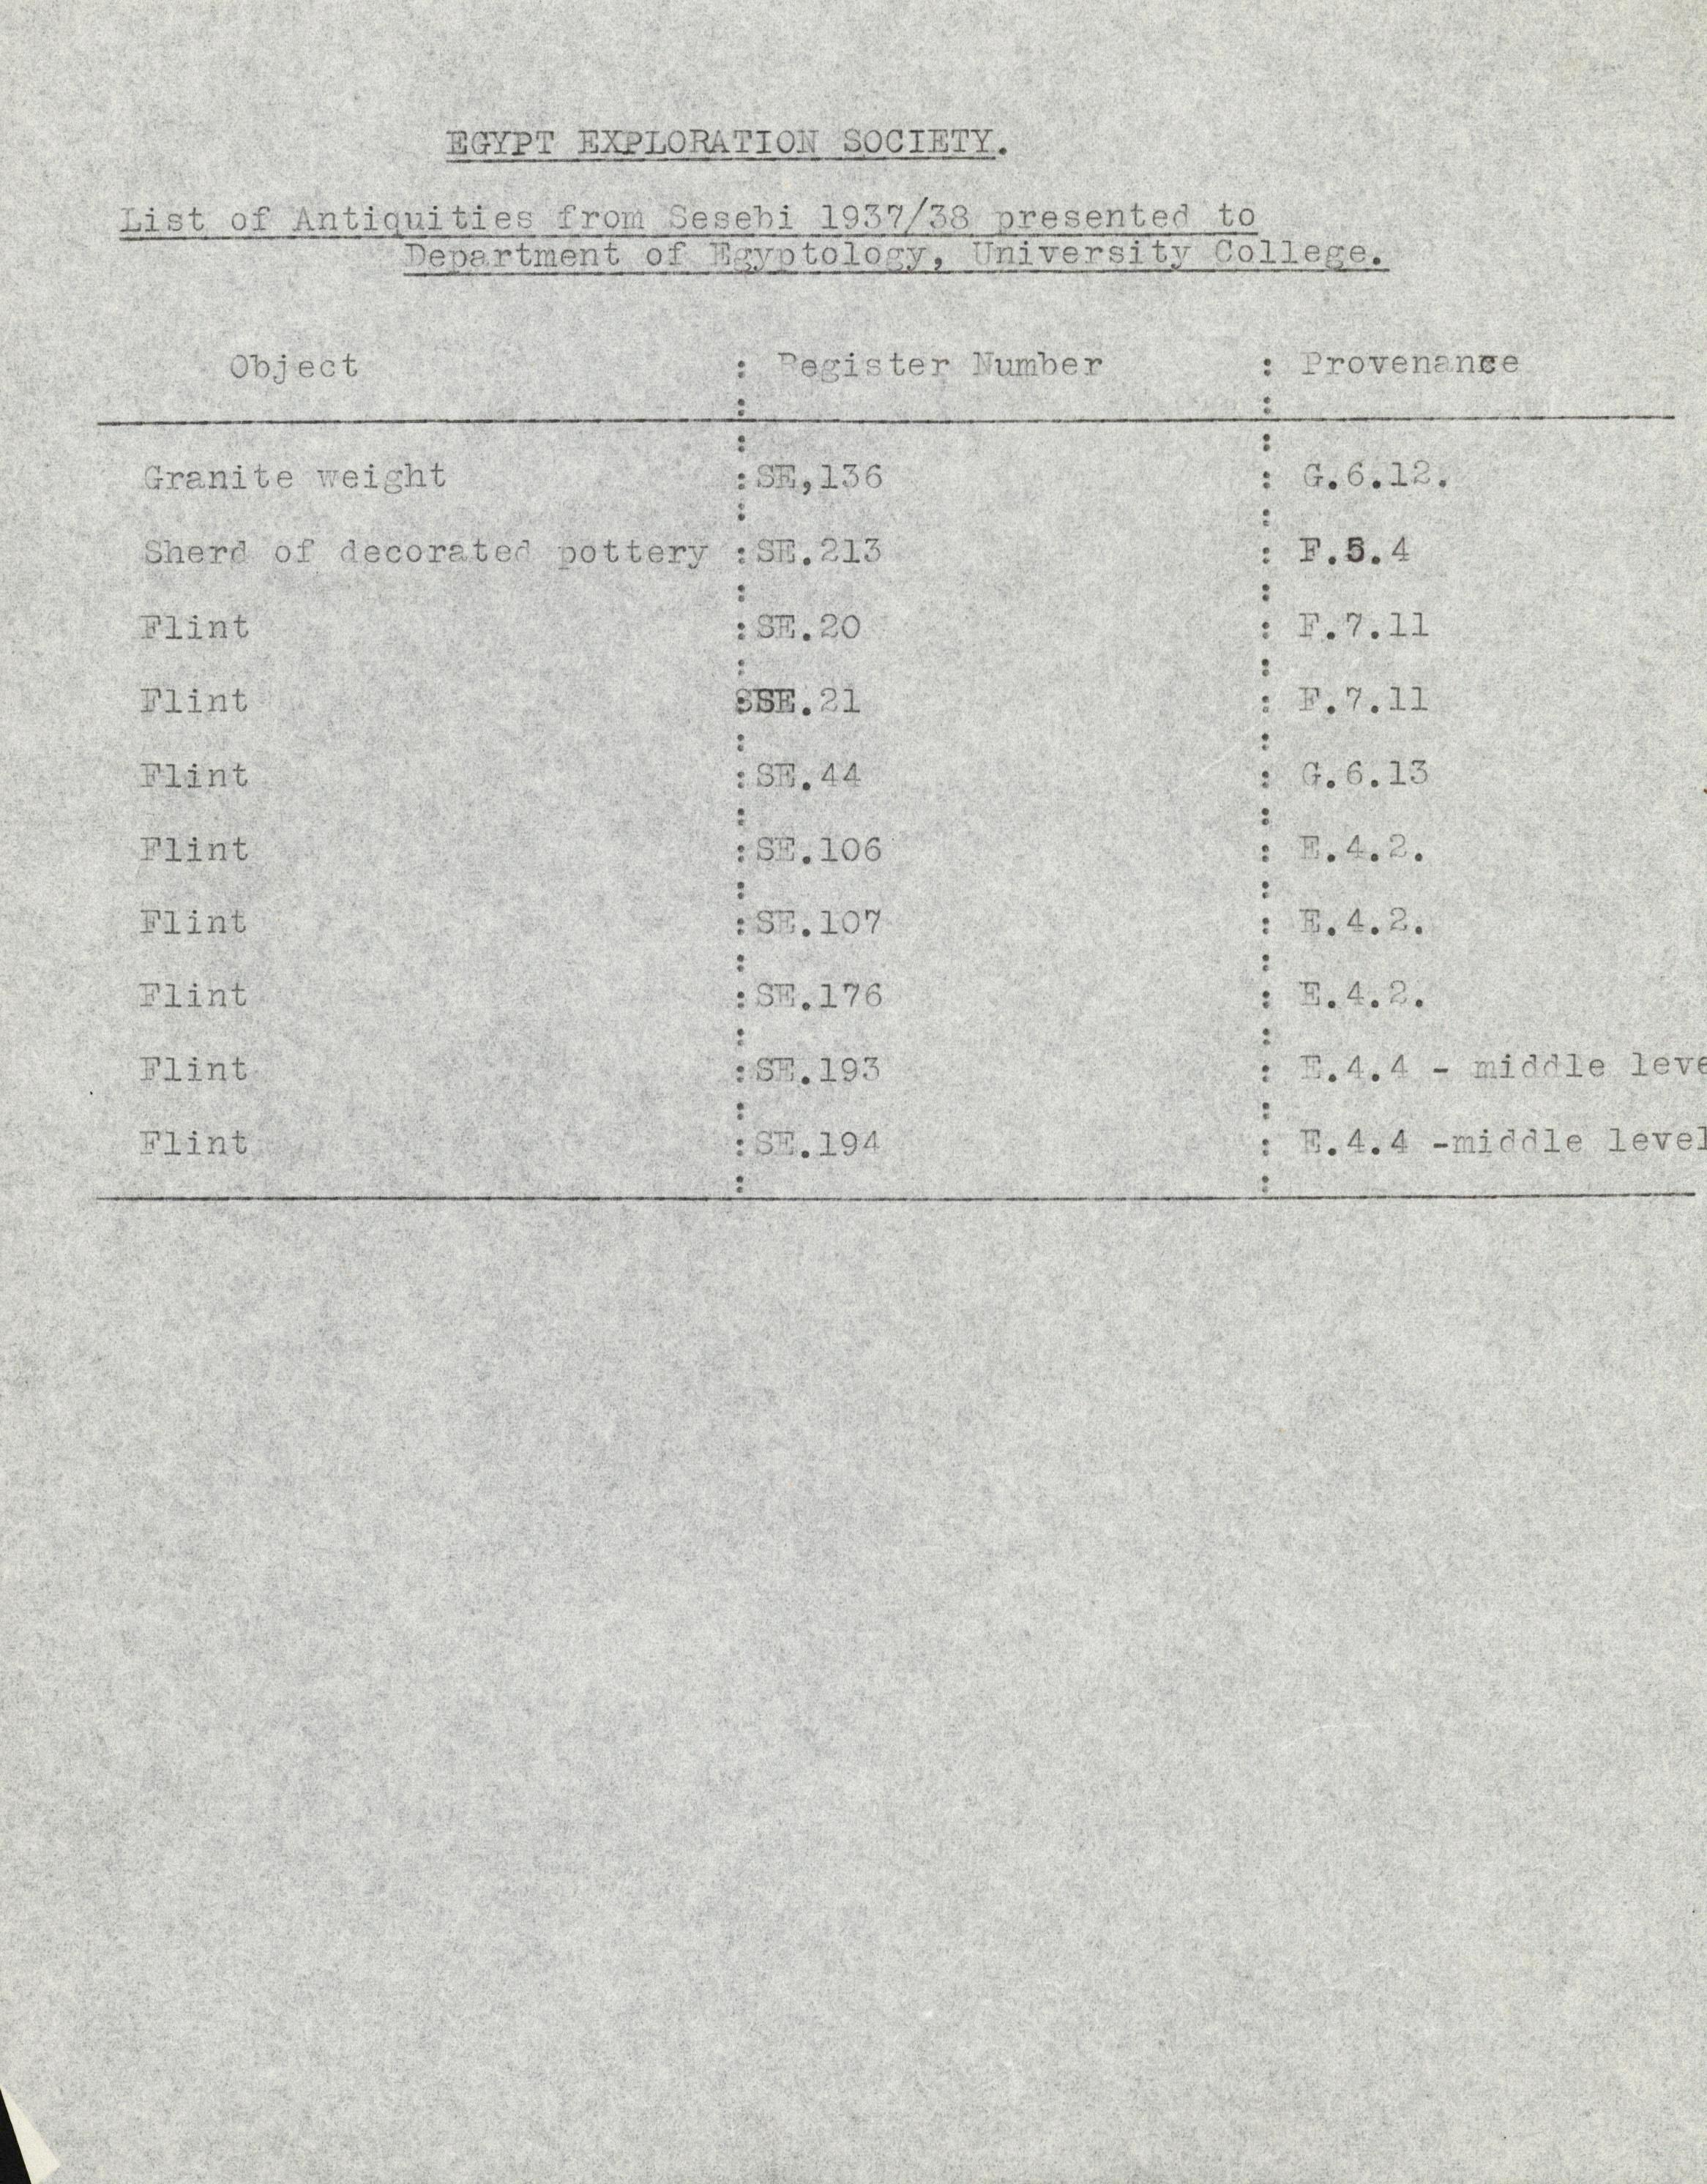 1936-38 Amarah West, Sesebi DIST.62.03f